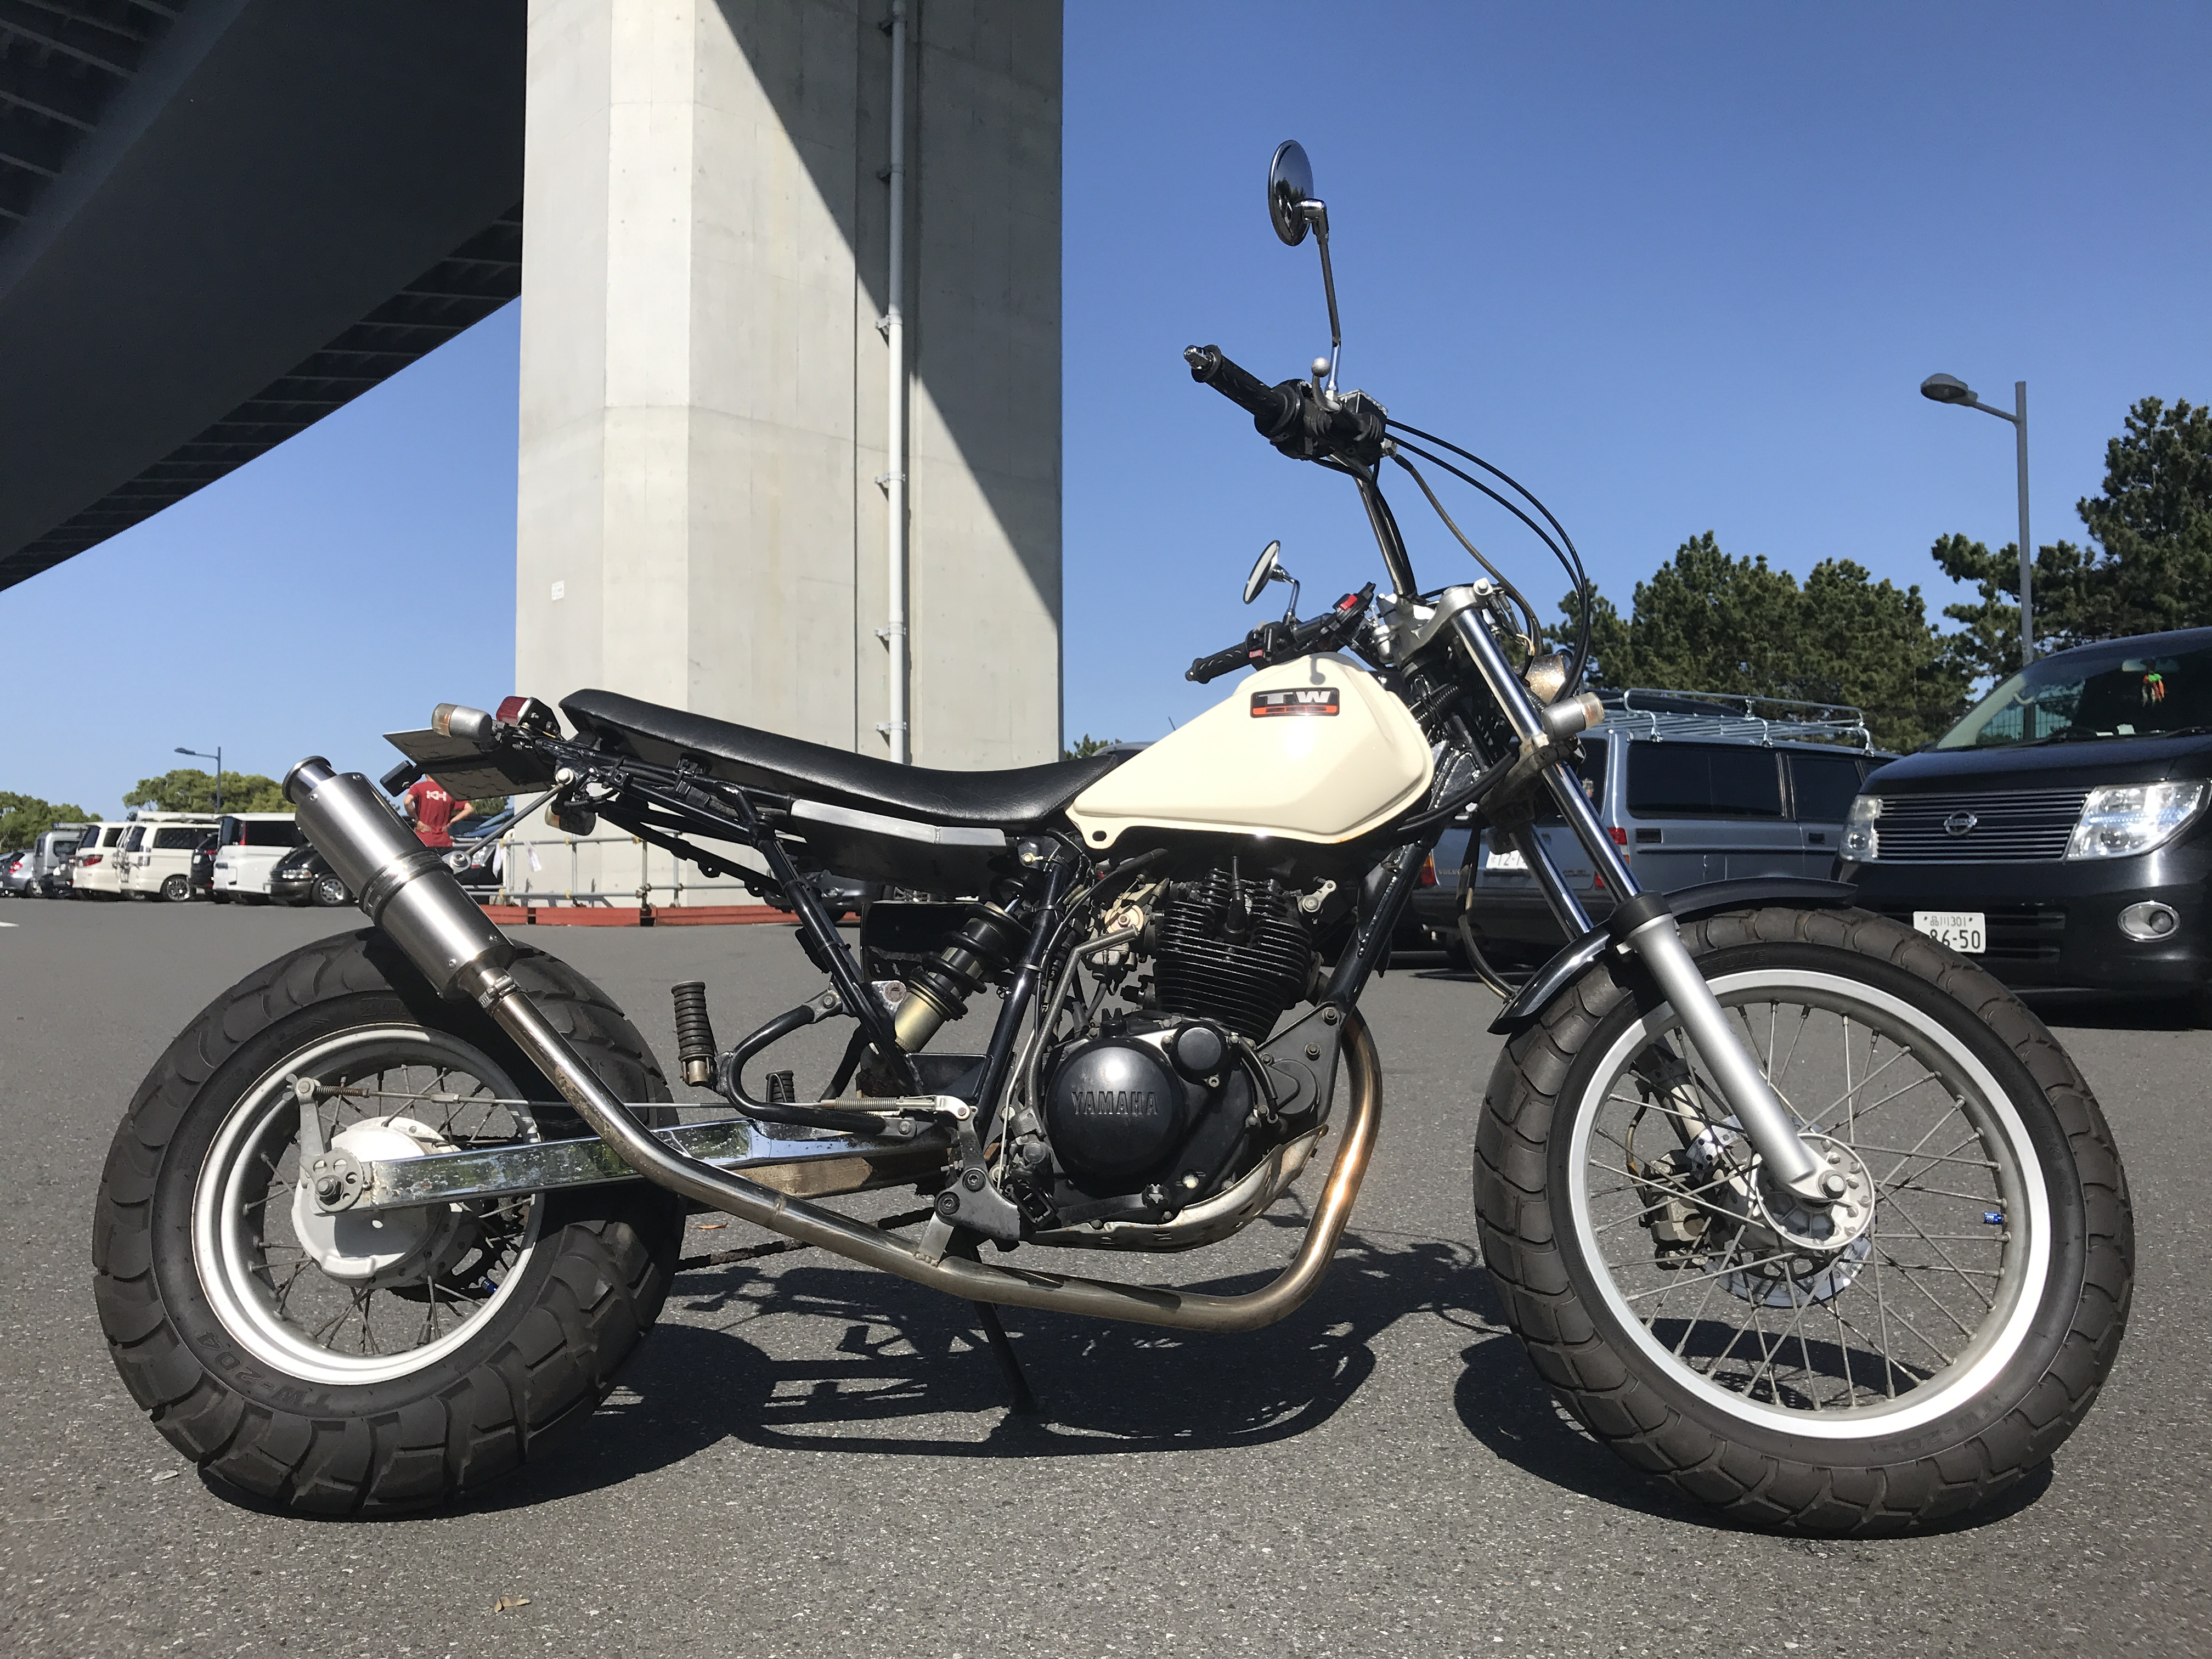 TW225カスタム (HN-00) - 【公式】レンタルバイクのベストBike® 新横浜駅前